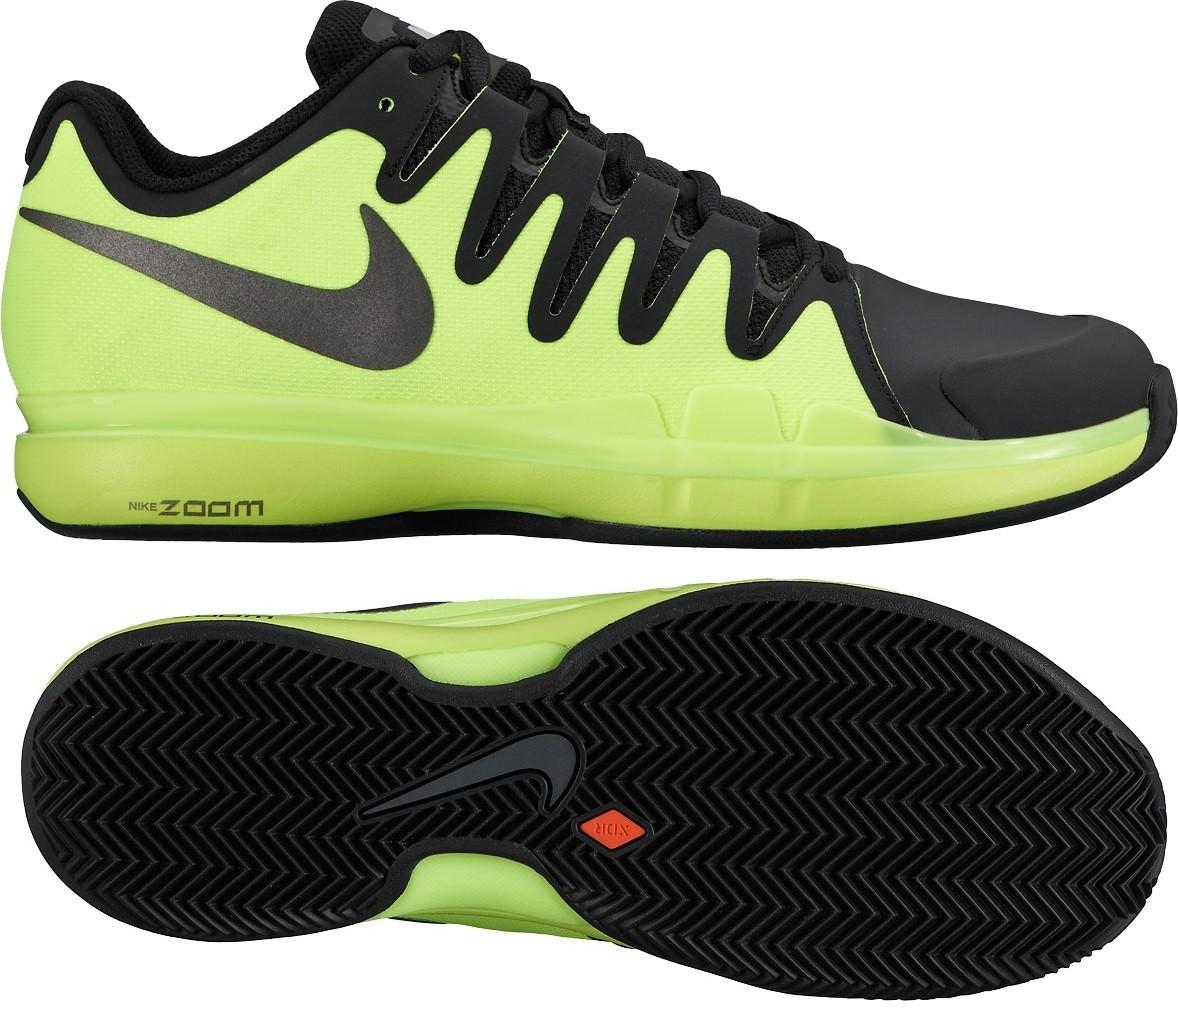 Tenisová obuv Nike R. Federer Zoom Vapor 9.5 Tour clay antuková ... 50bd679ec7